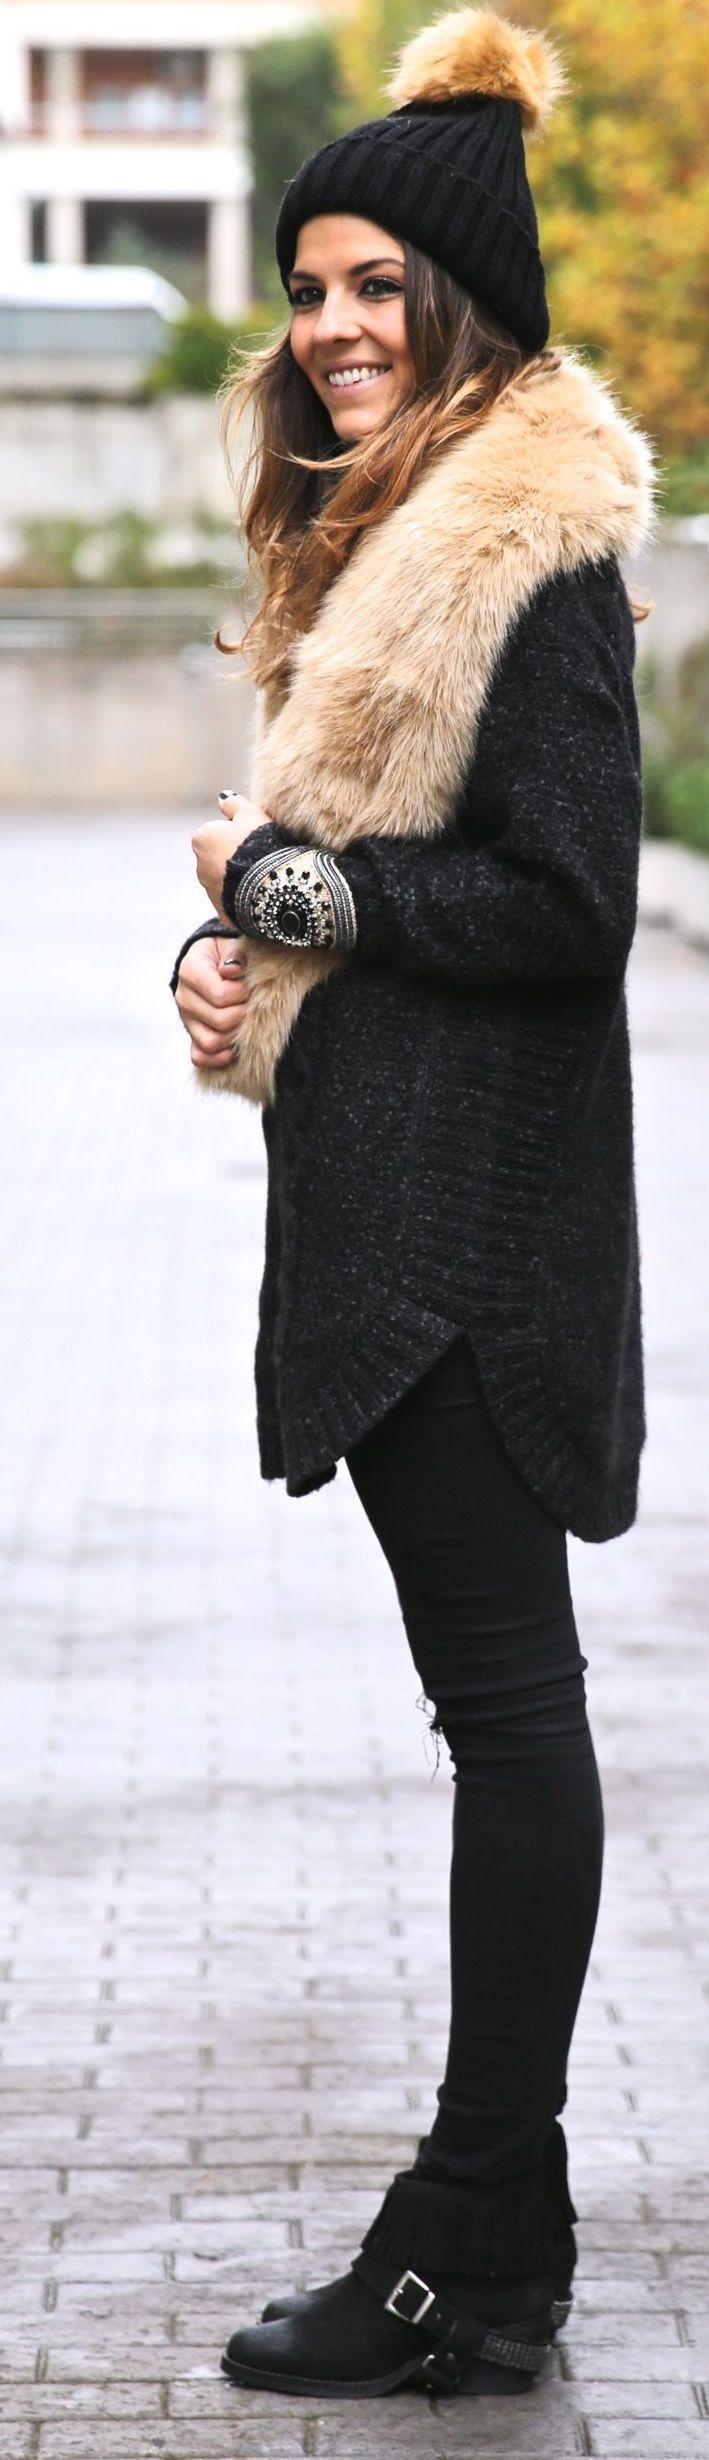 Black And Camel Faux Fur Collar Coat by TrendyTaste